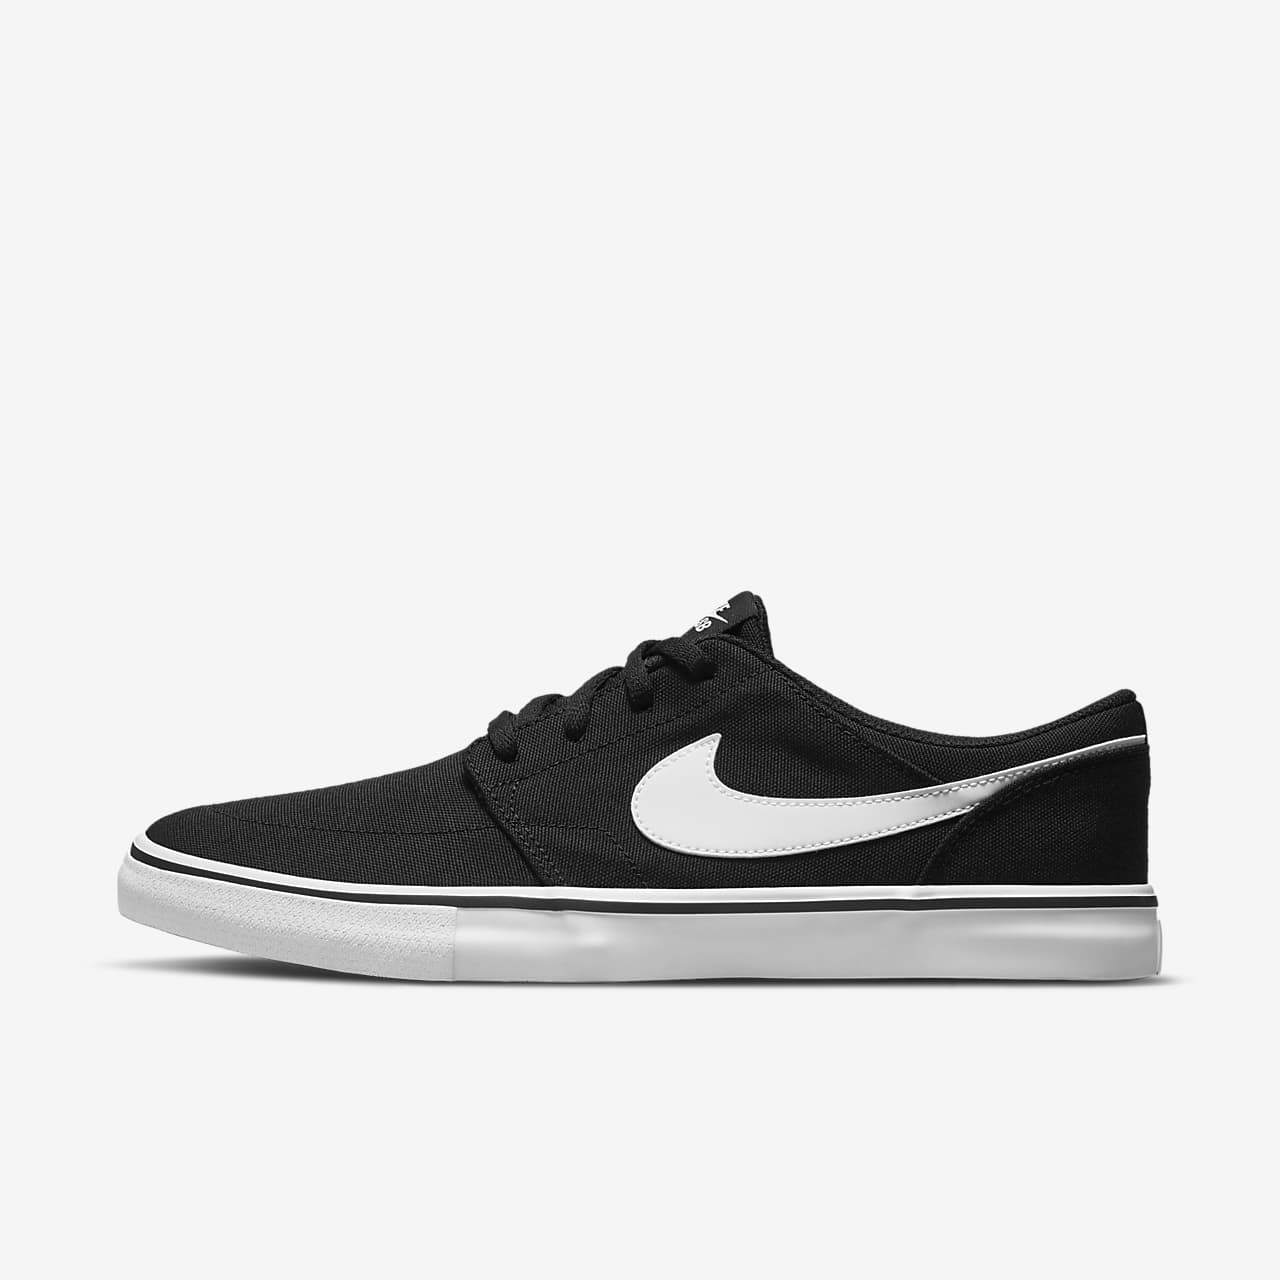 Nike SB Solarsoft Portmore 2 Skateboardschuh